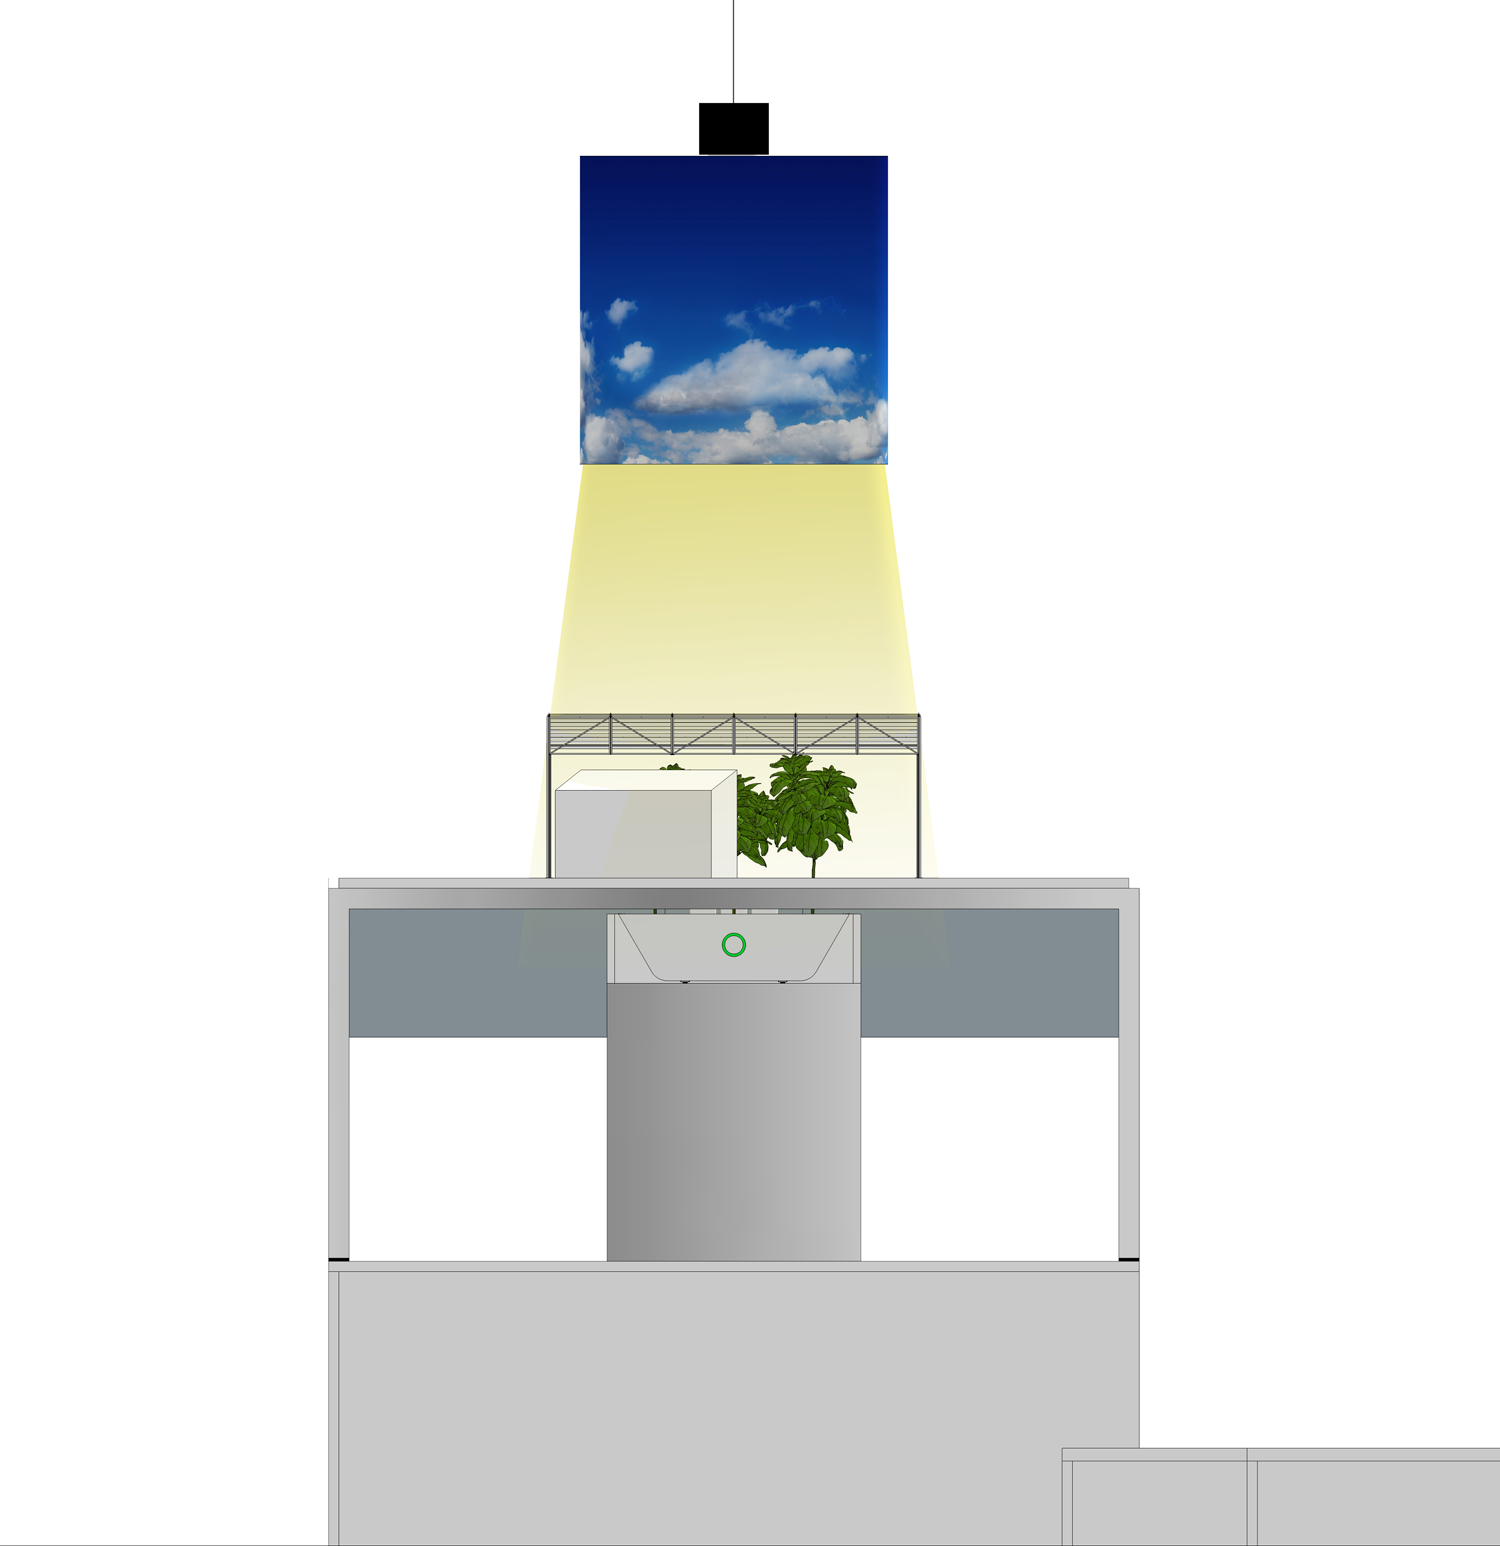 Designed display inside pavilion conceptual approach Peia Associati}